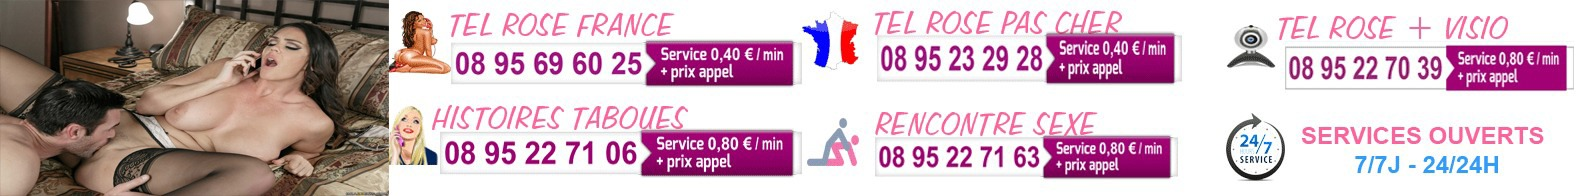 Tél rose France femmes Françaises avec webcam Skype